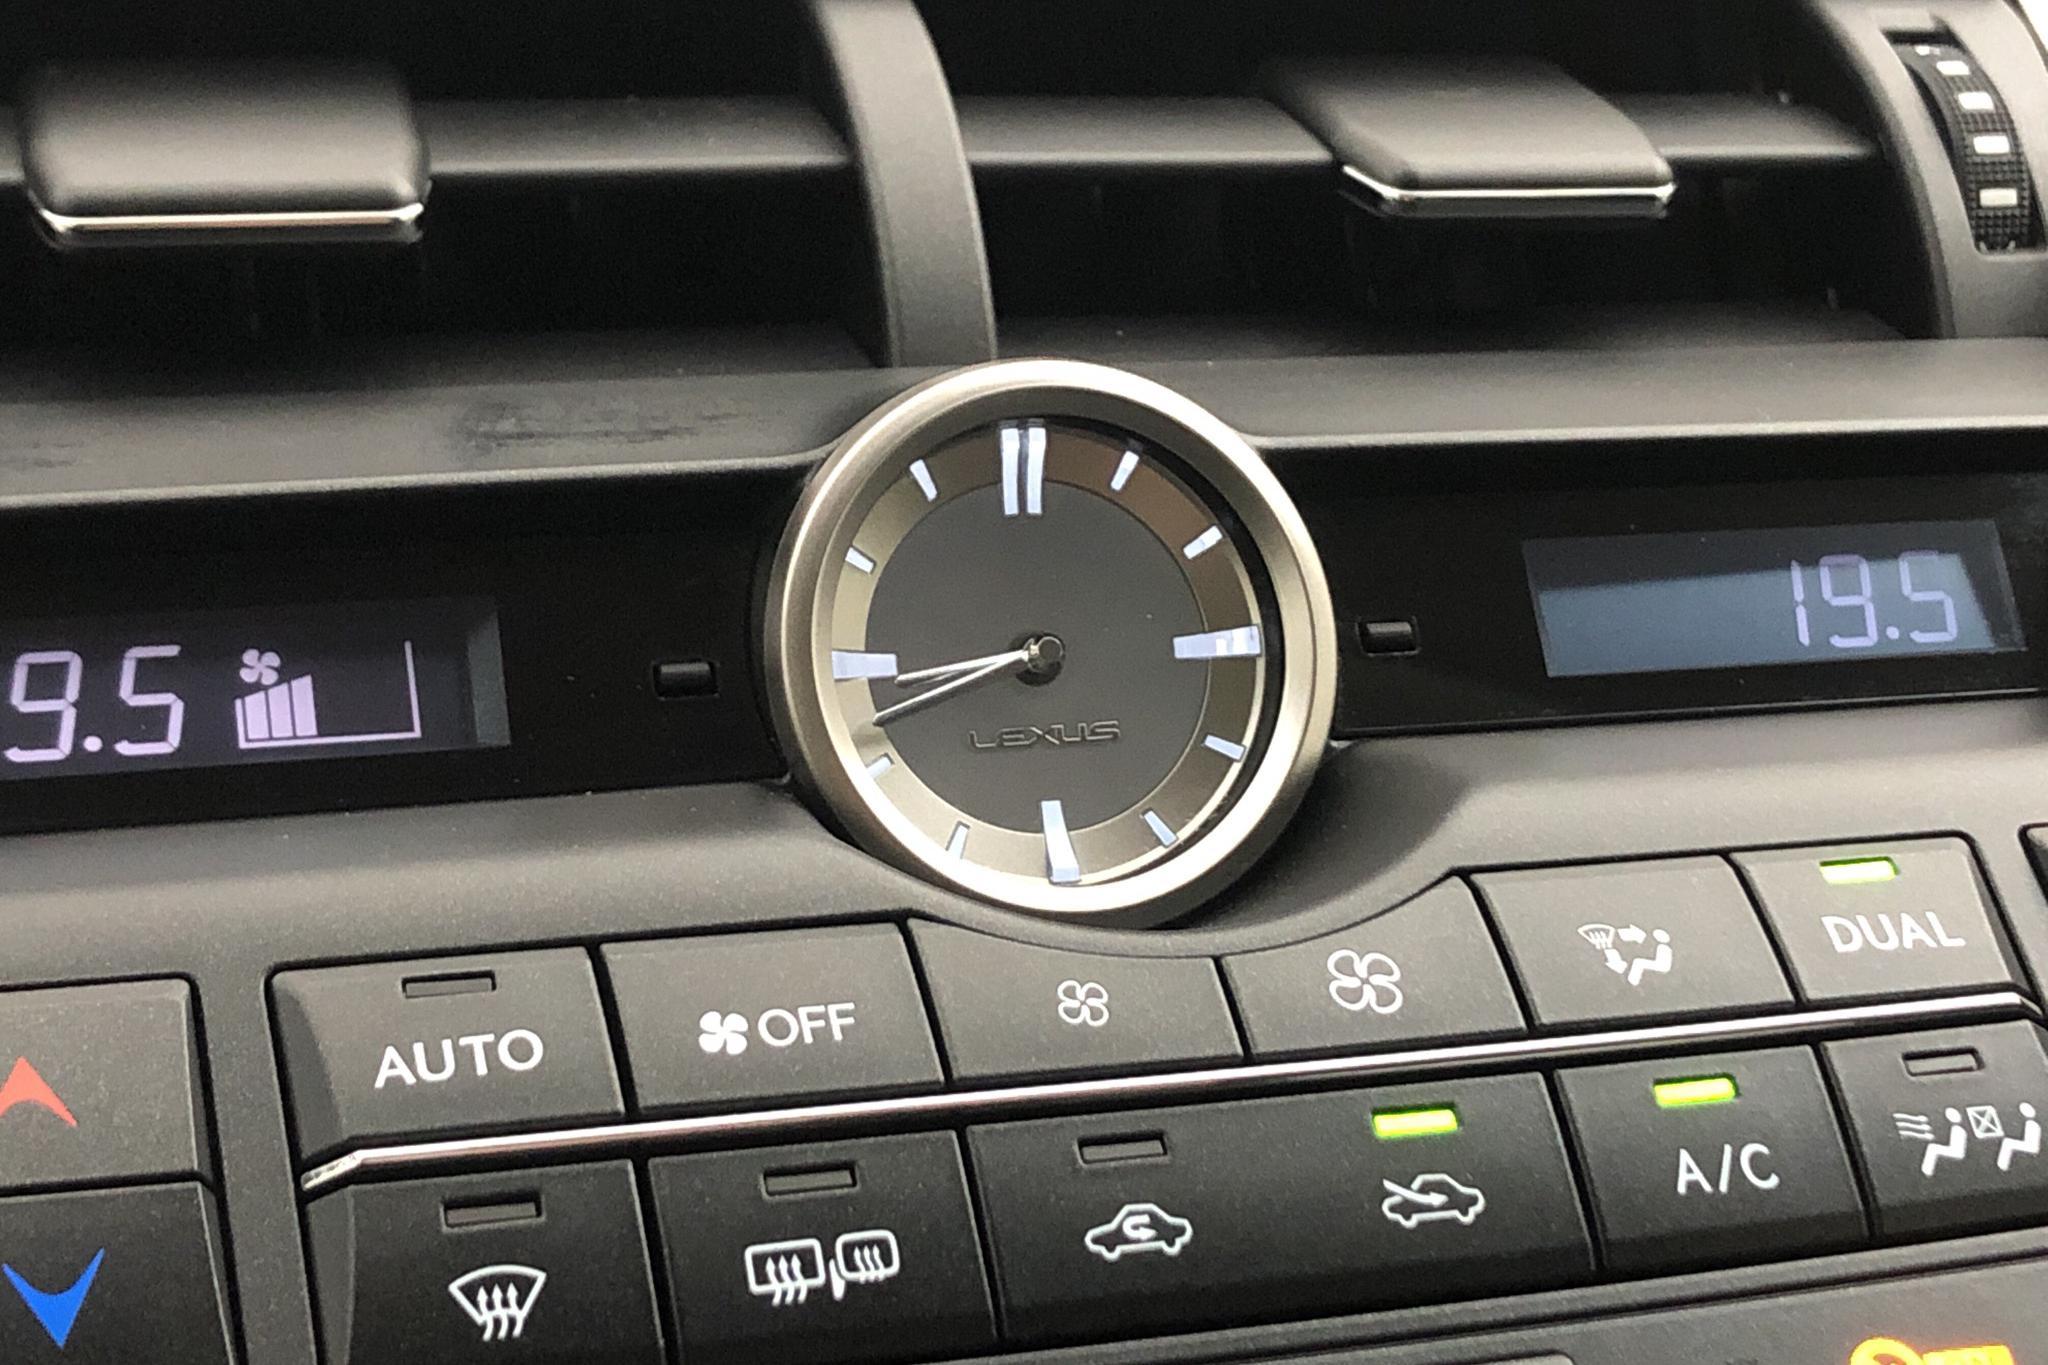 Lexus NX 300h AWD (181hk) - 75 890 km - Automatic - gray - 2015